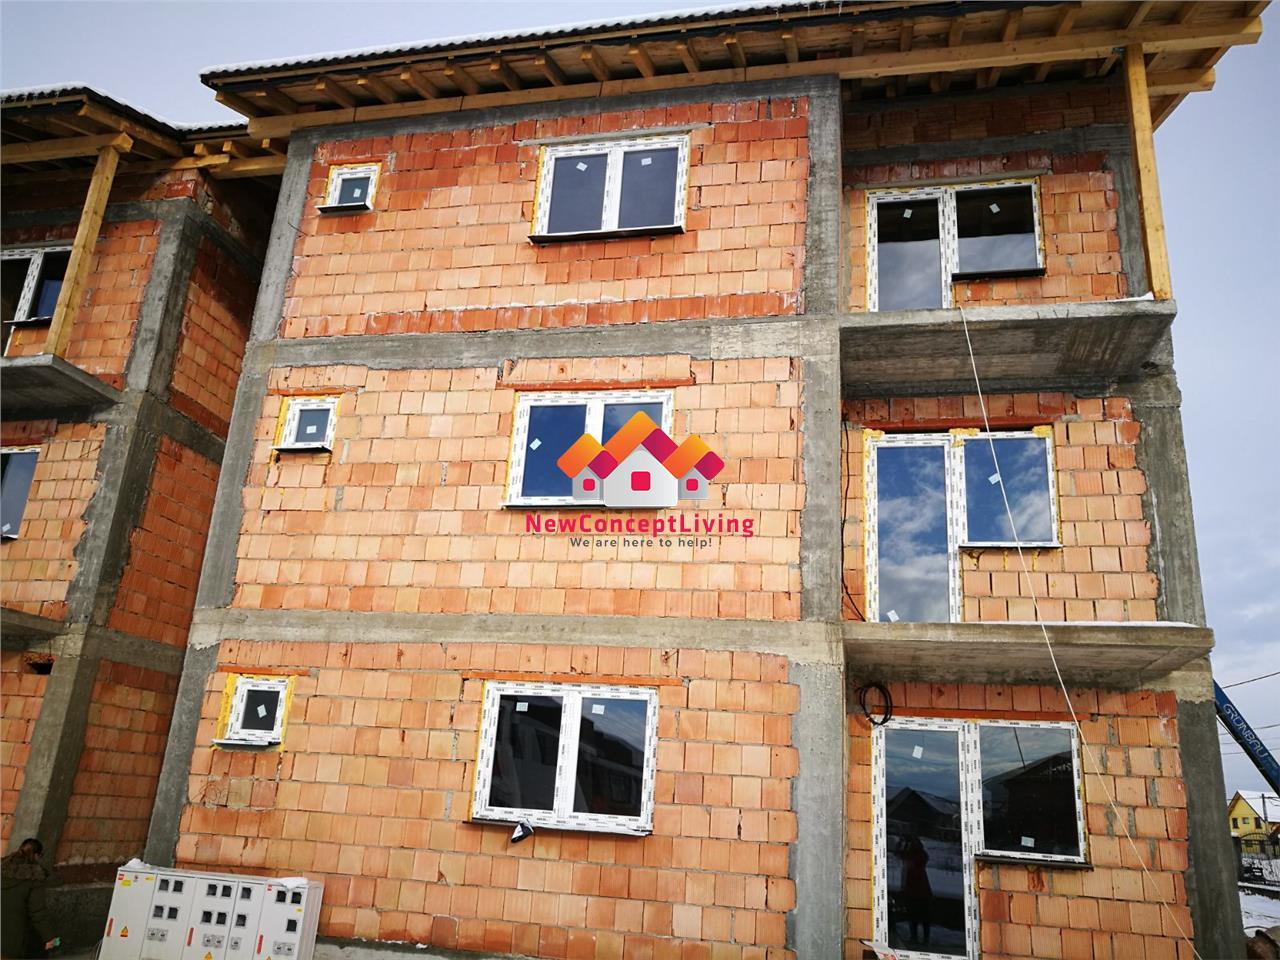 Apartament de vanzare in Sibiu, 3 camere, bine compartimentat